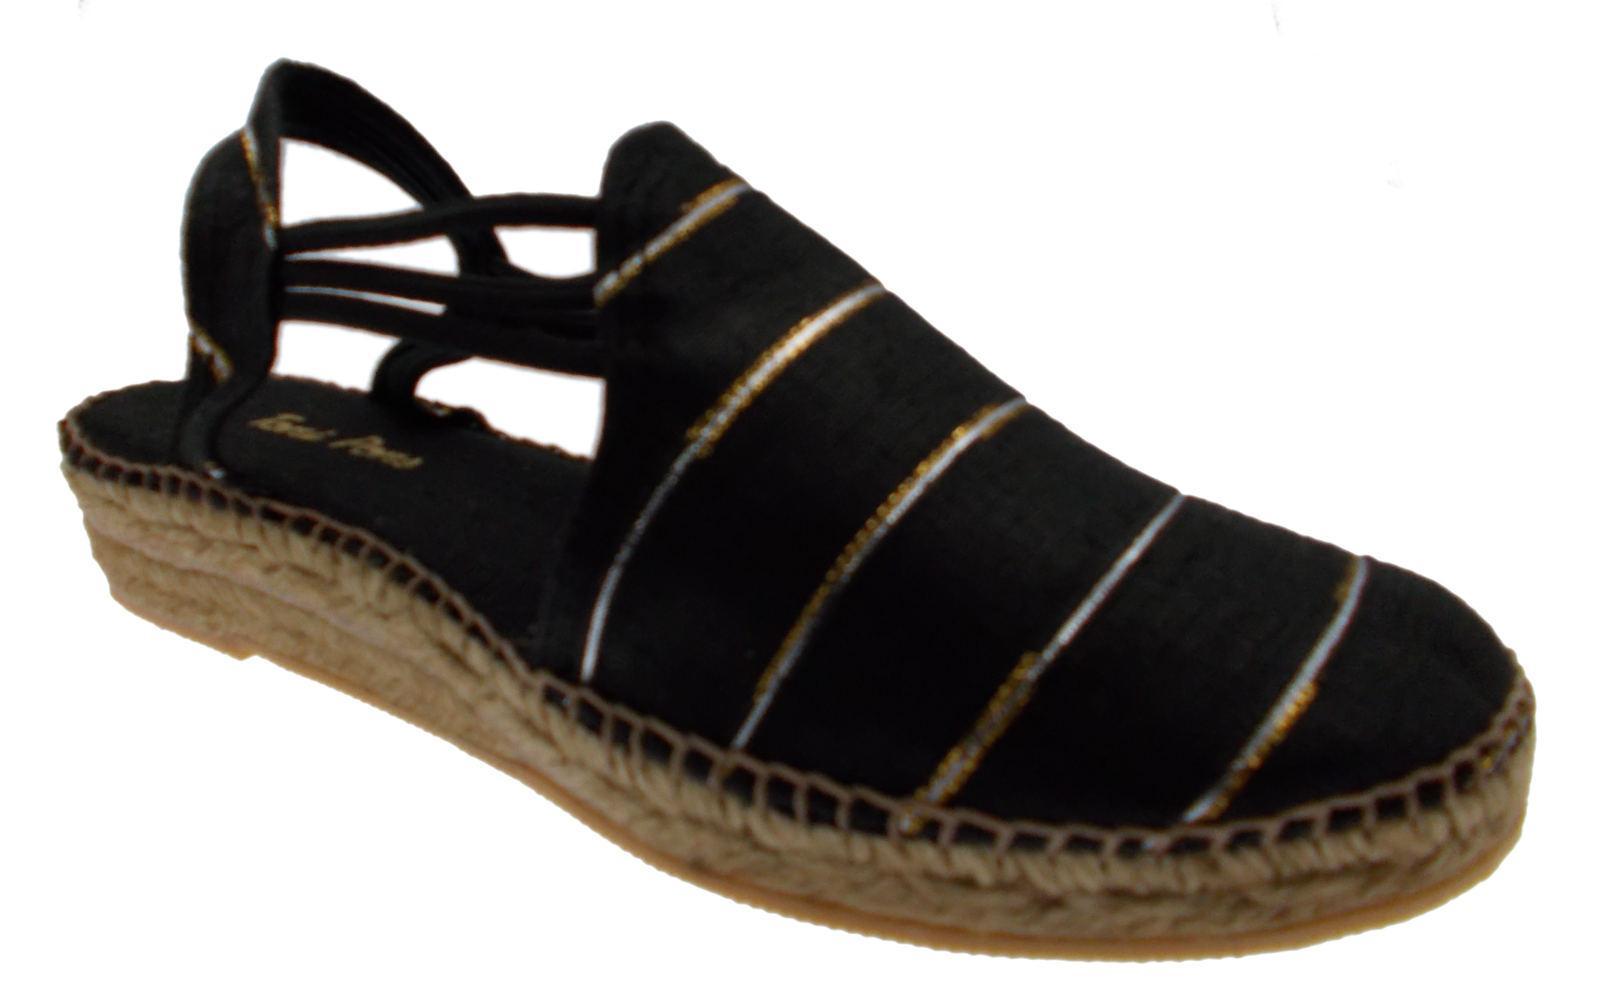 Sandalo corda nero NANTES  righe chiuso zeppa art NANTES nero Toni Pons 9e51f8